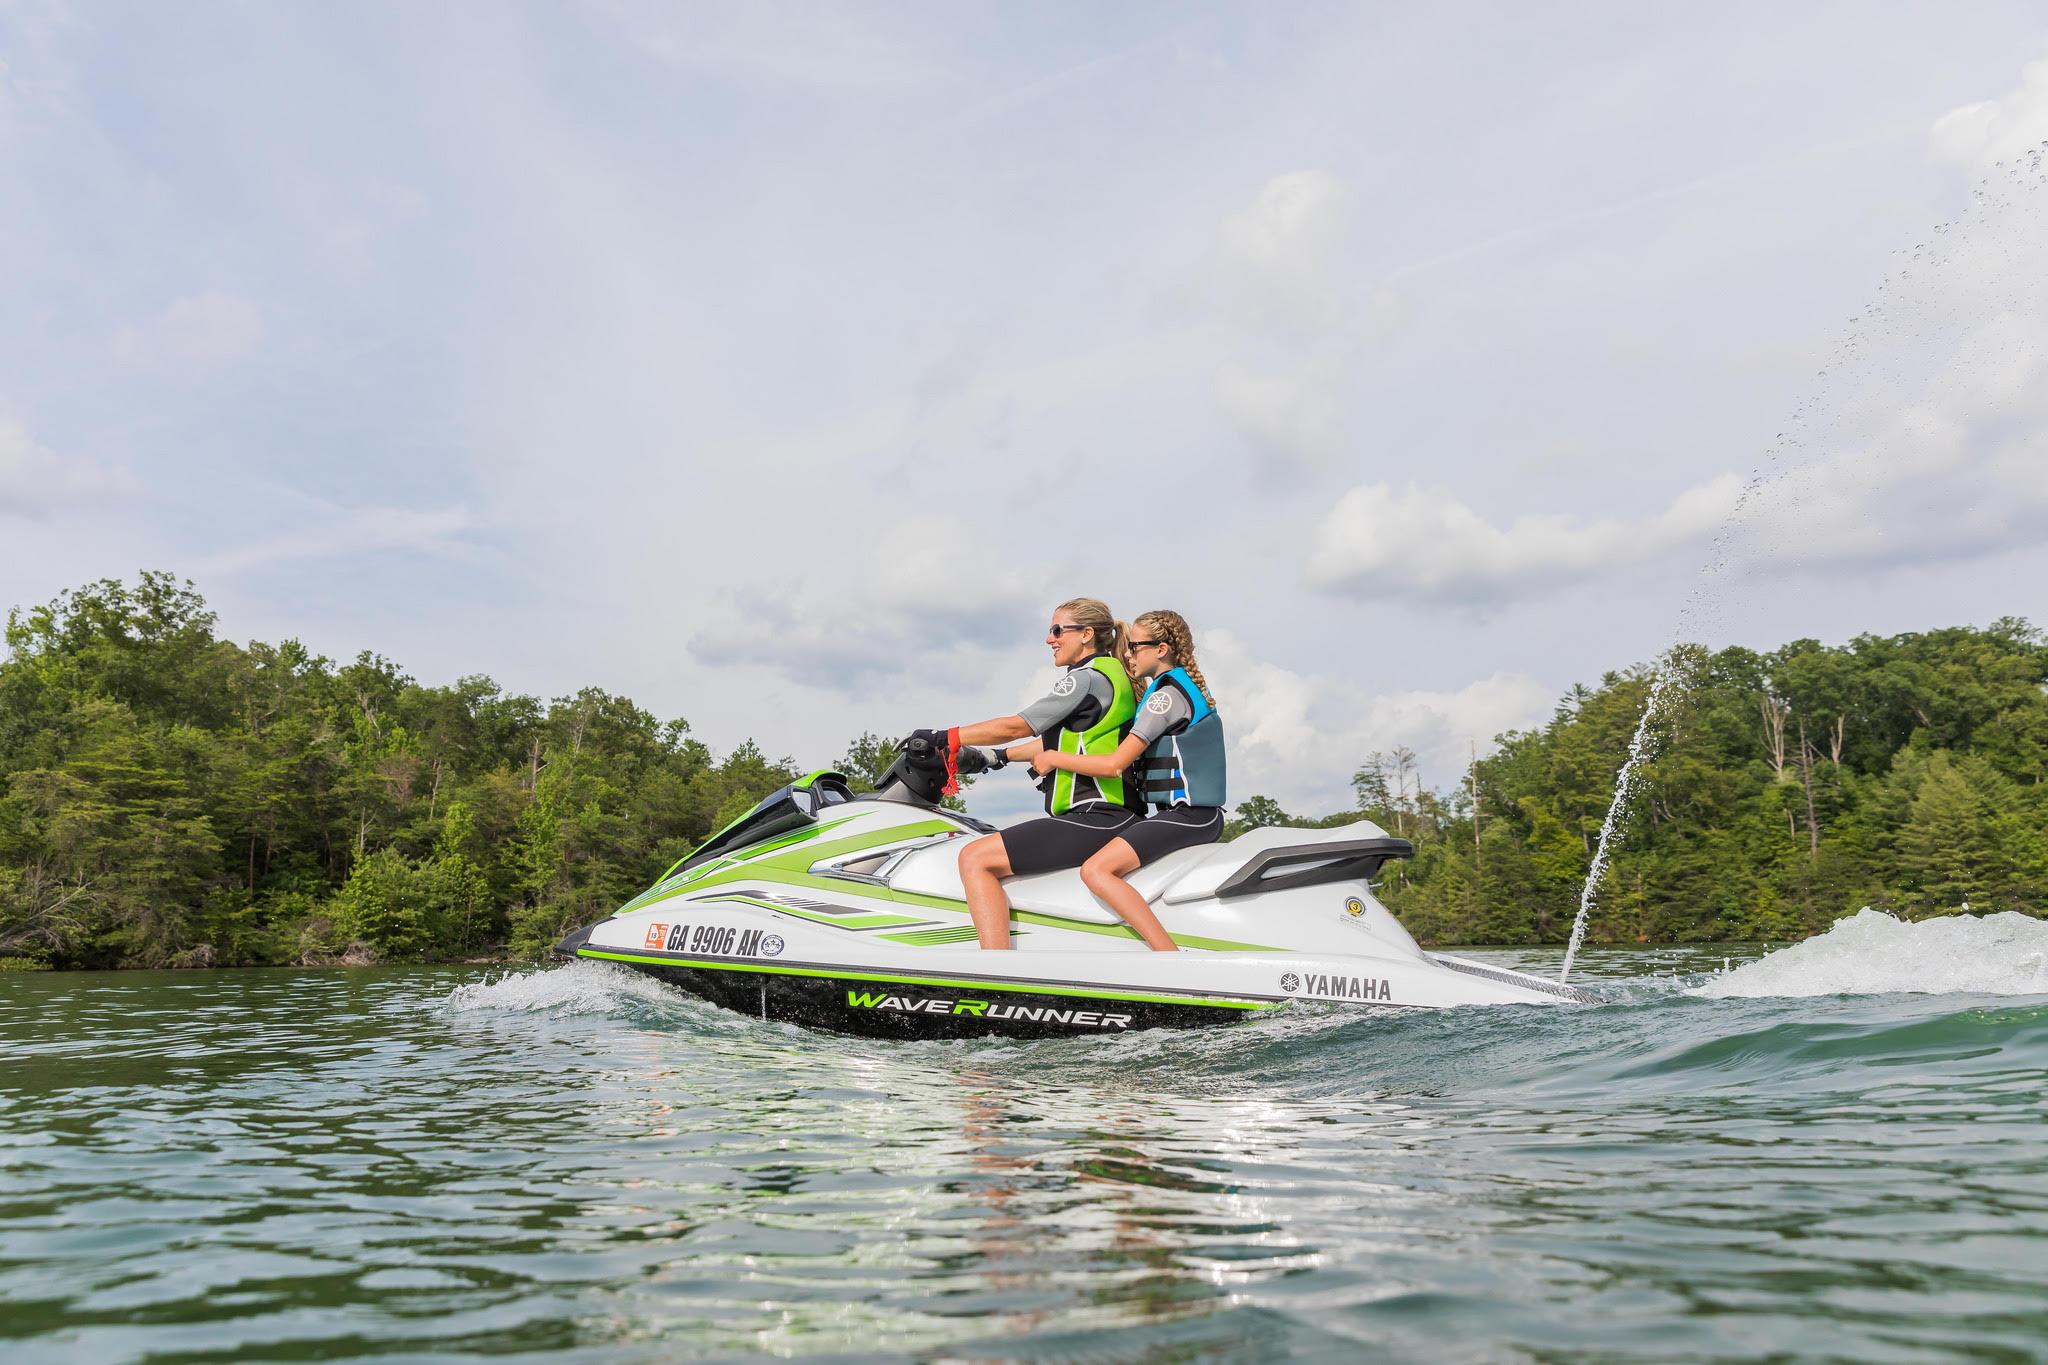 myrtle beach jet ski rental prices